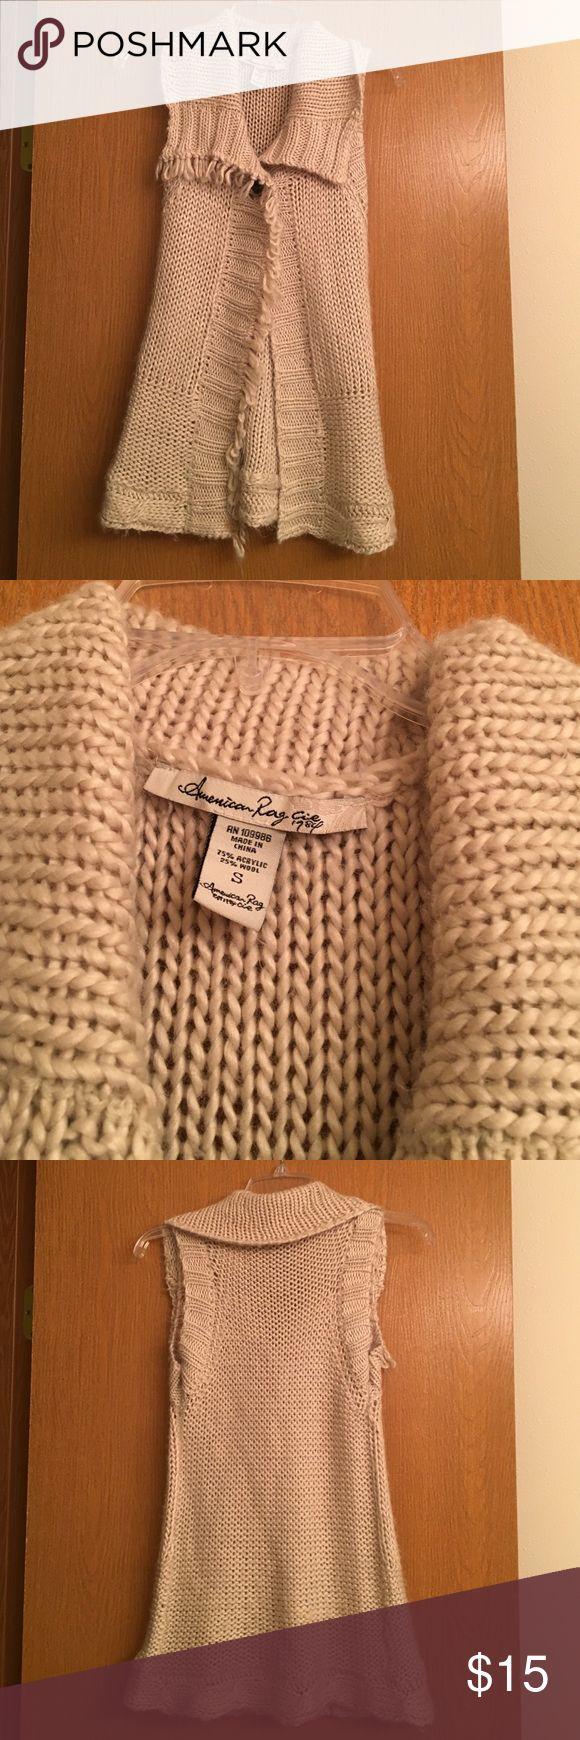 Final PriceAmerican Rag Sweater Vest Great looking sweater vest. American Rag Sweaters